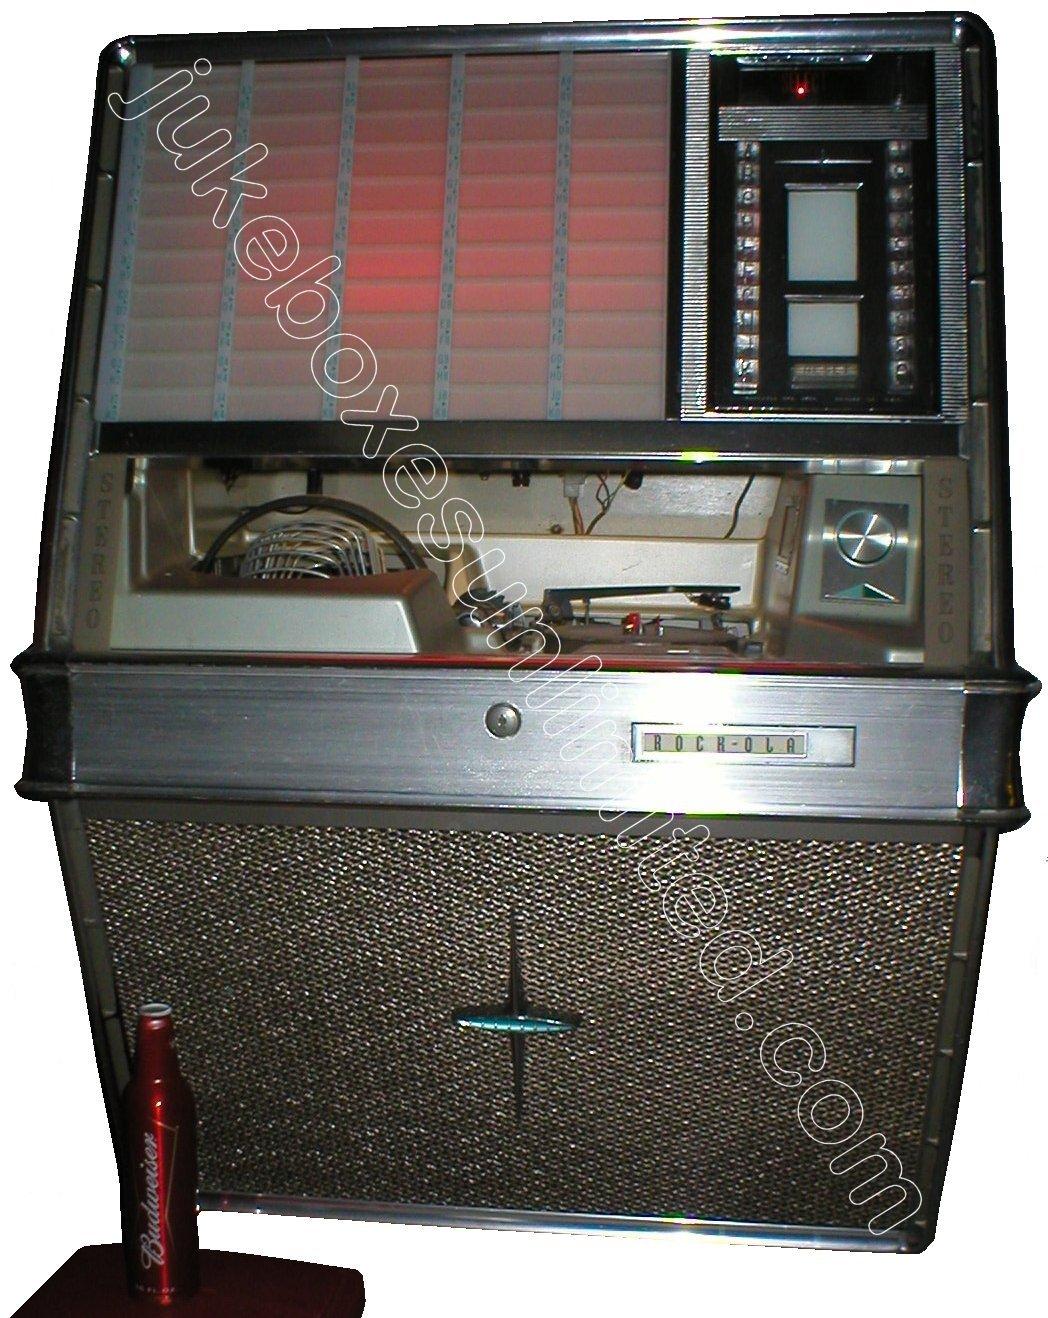 JUKEBOXES UNLIMITED, Los Angeles - Jukeboxes For Sale